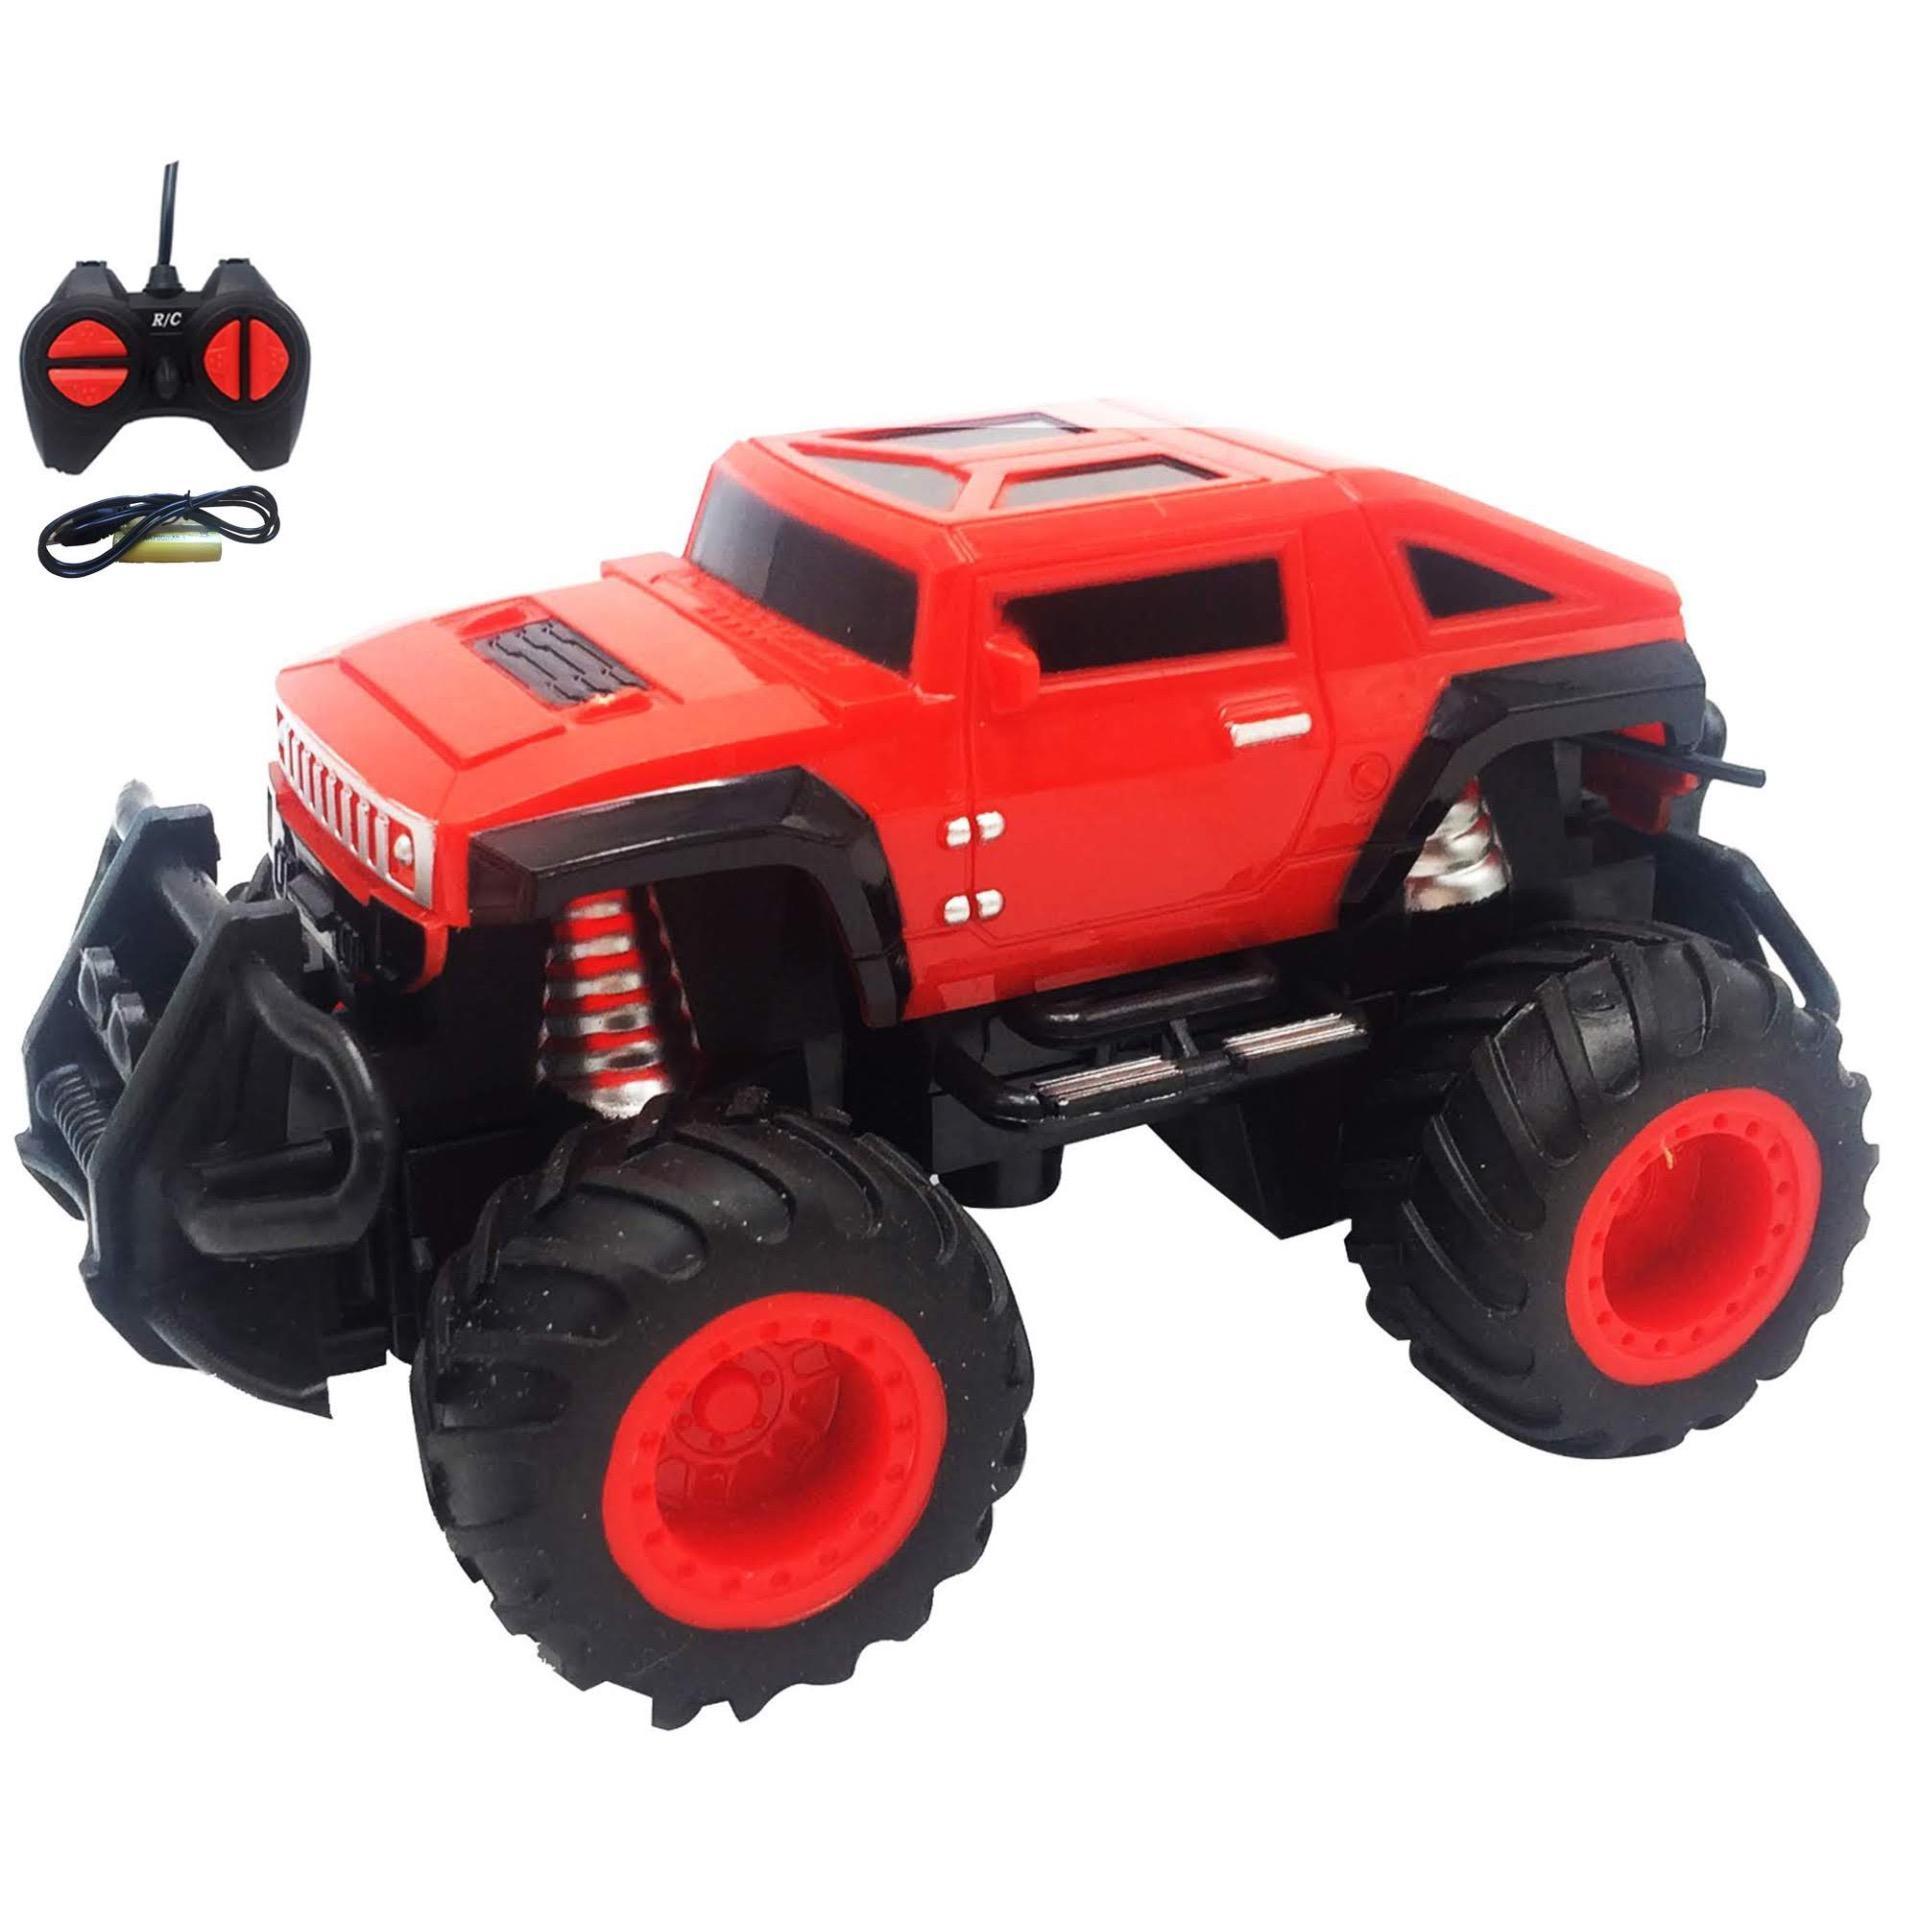 (BATERAI CAS + ADA LAMPU) RKJ Mainan Anak RC Mobil Remot Mini Car Land 995d495f2e